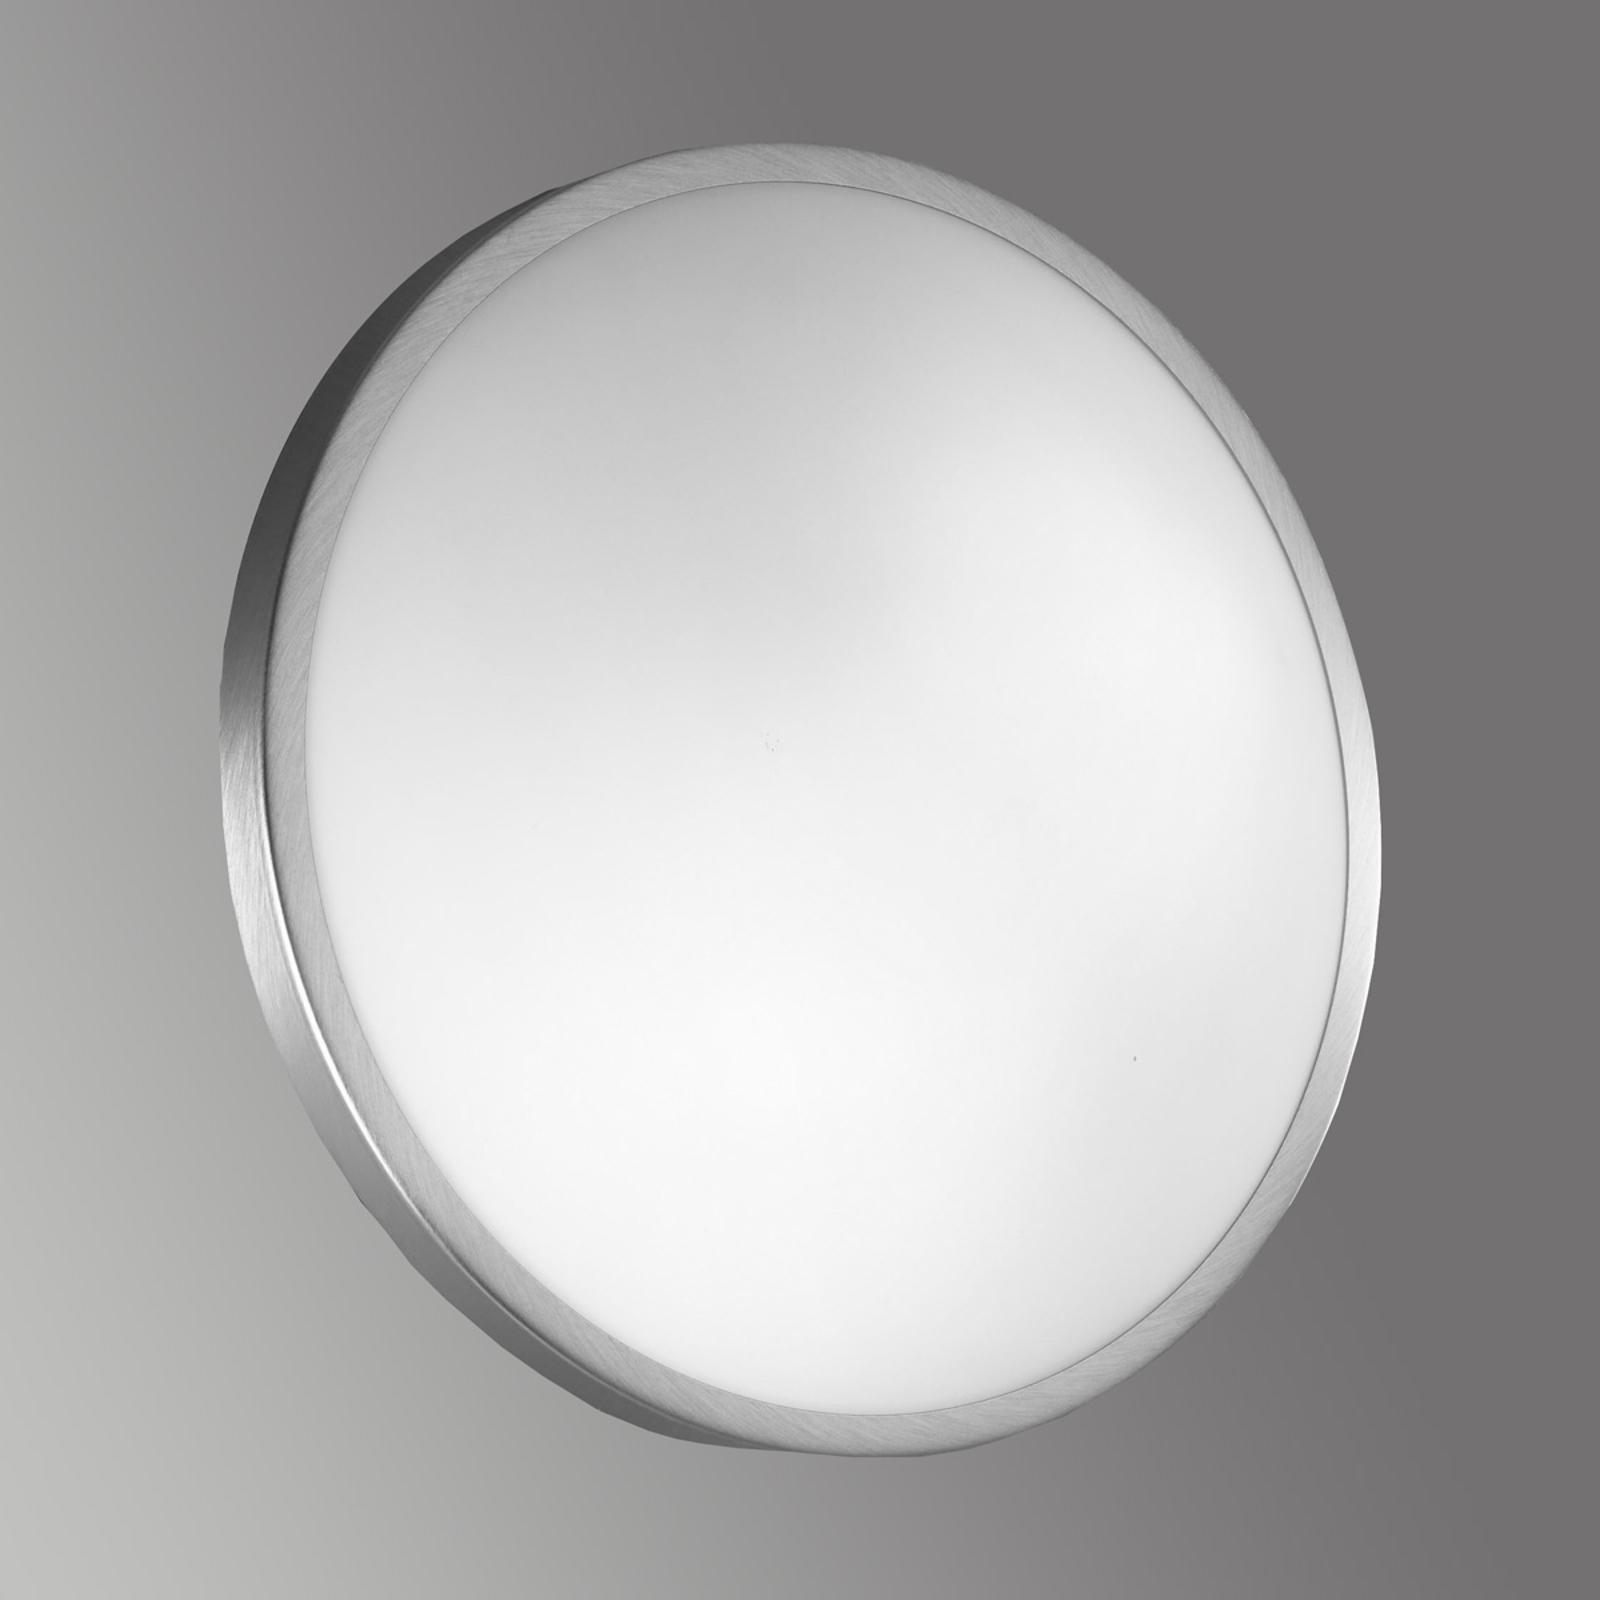 Szklana lampa sufitowa i ścienna PLAZA, nikiel